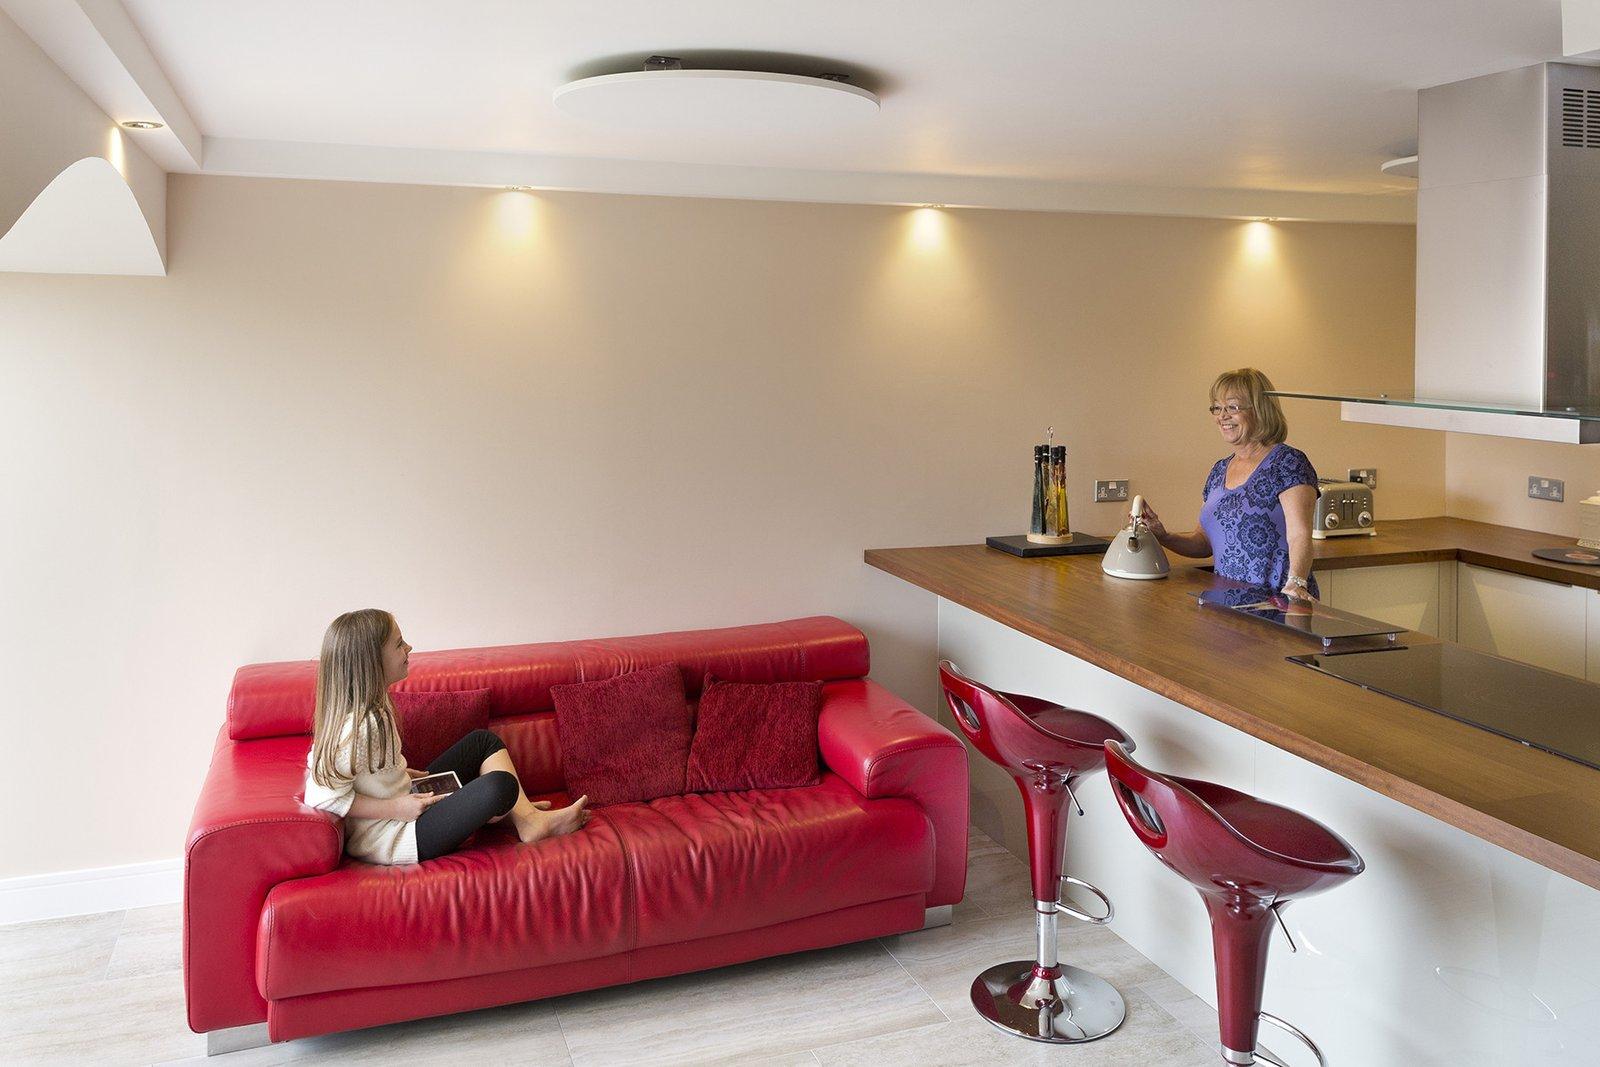 Redwell_Infrared_Heater_ceiling_Round3_1600x1600